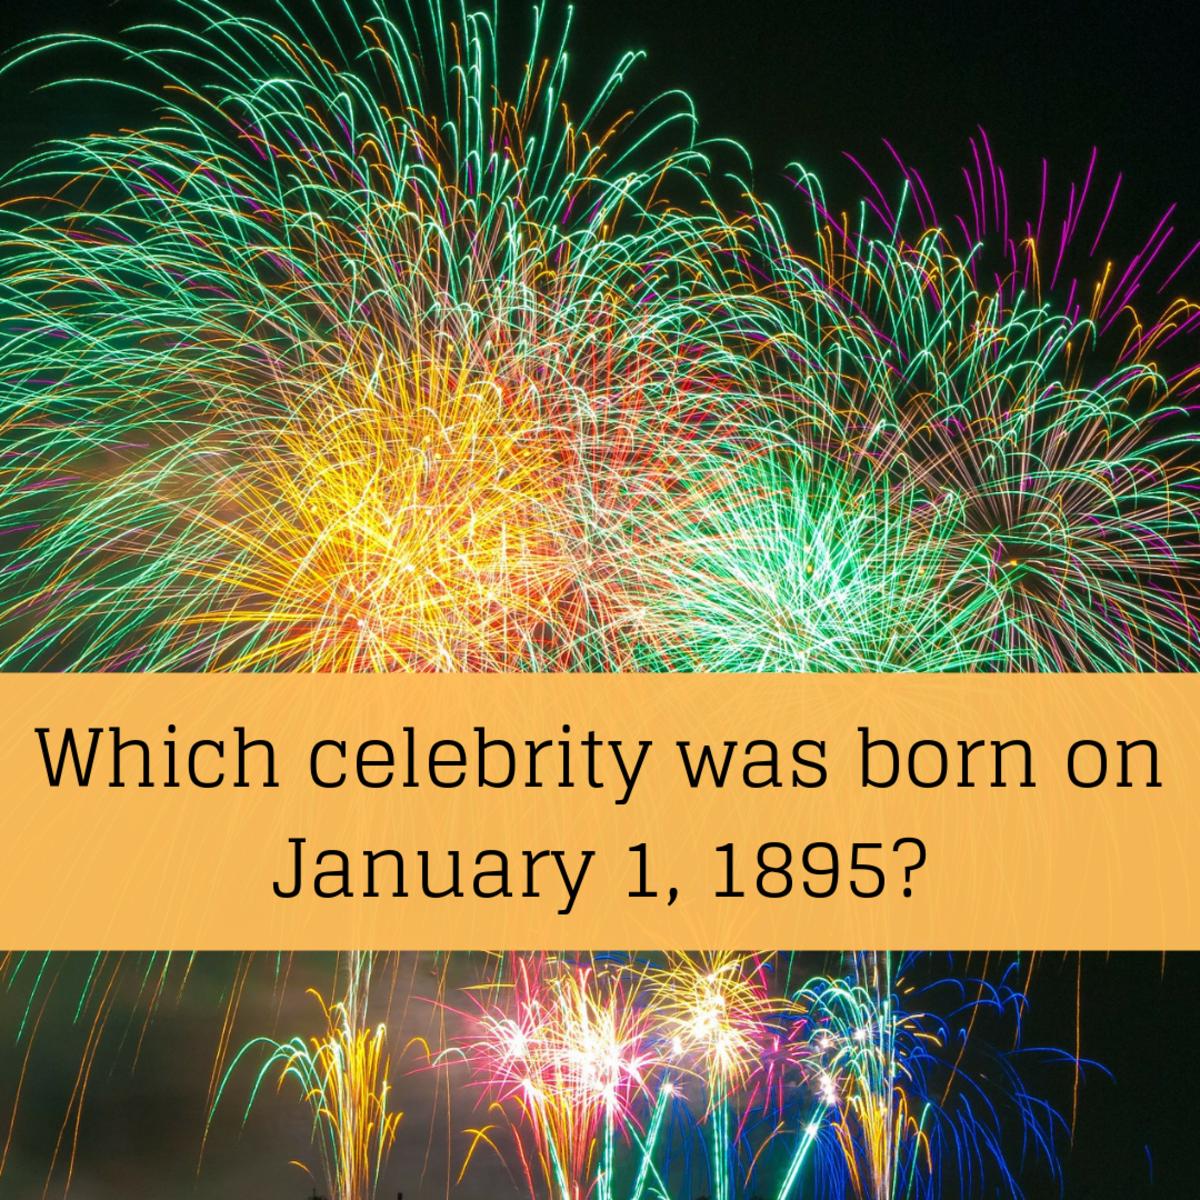 Quiz question #18.